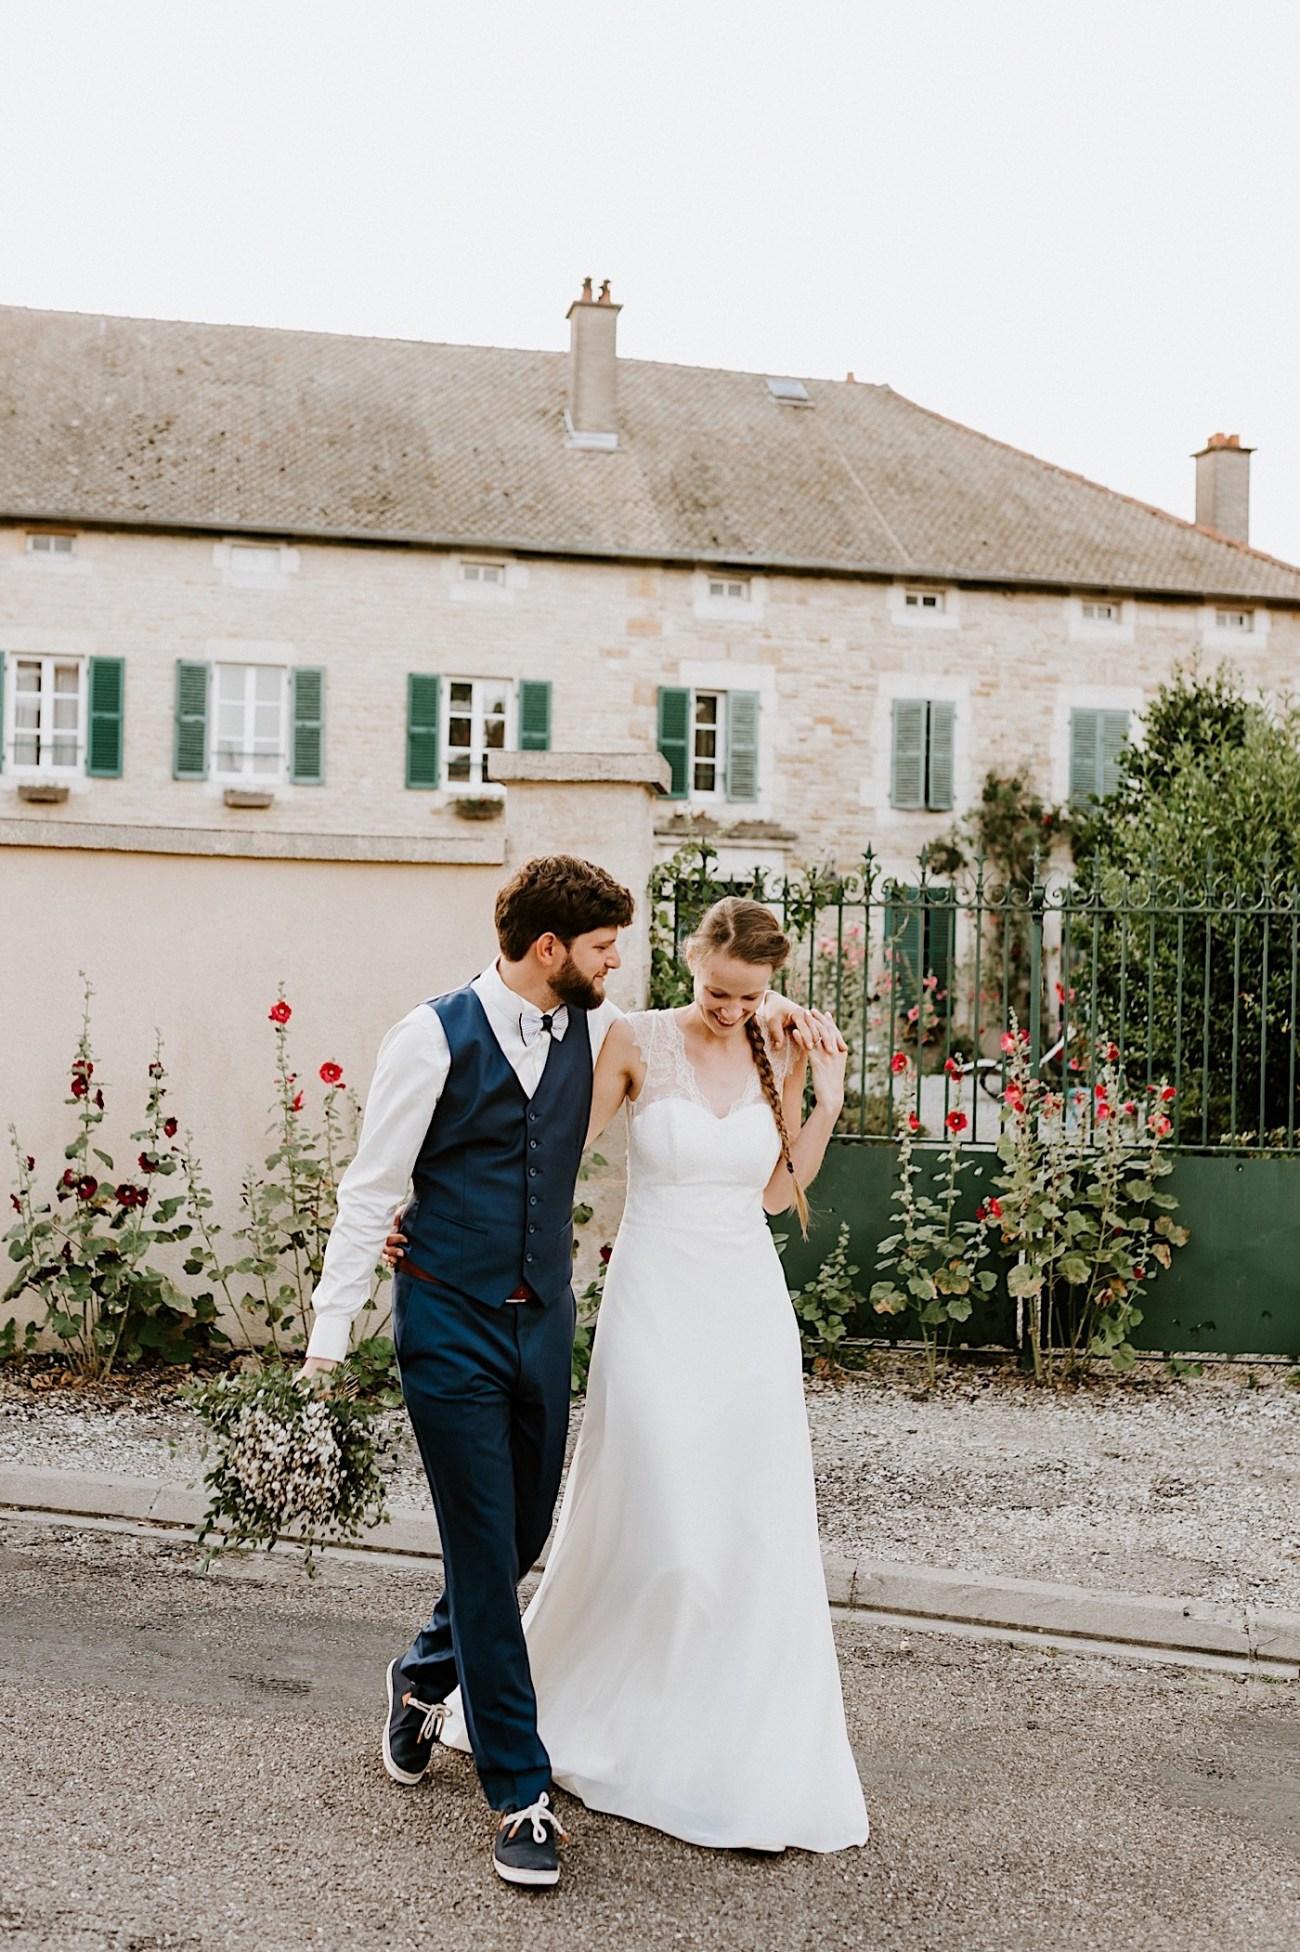 French Rural Wedding After Wedding Day Photos Paris Wedding Photographer 013